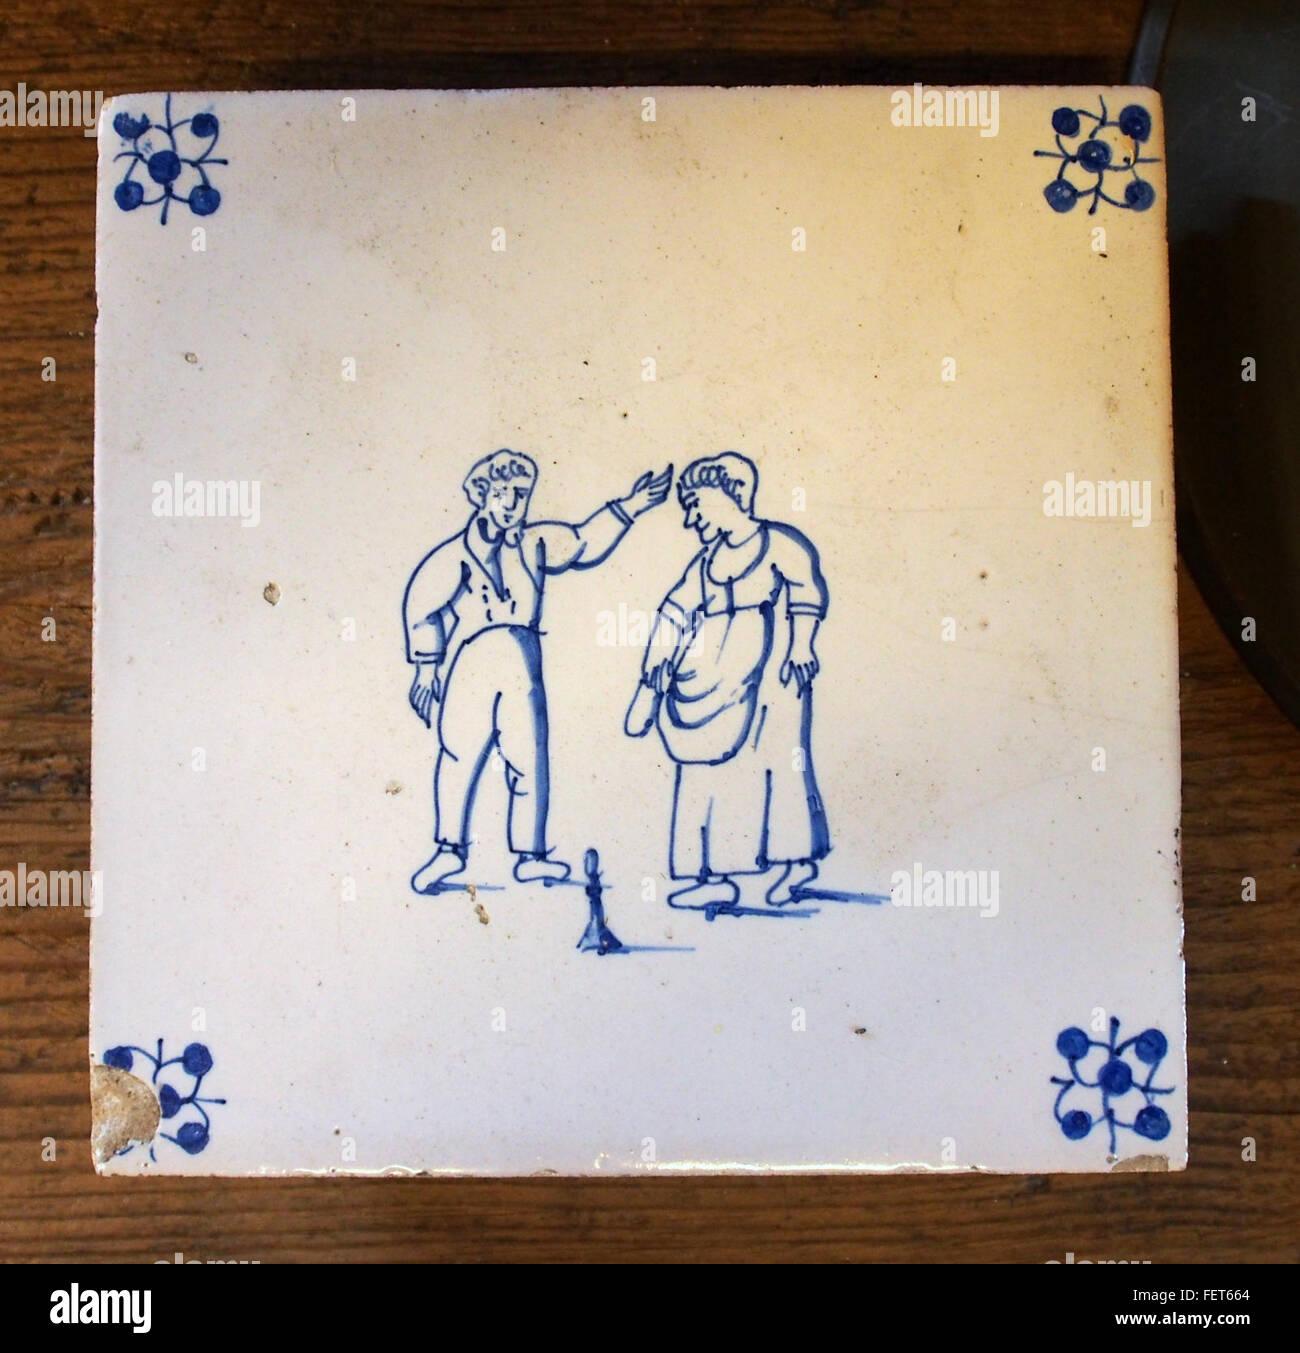 Delftware tiles depicting 2 persones - Stock Image